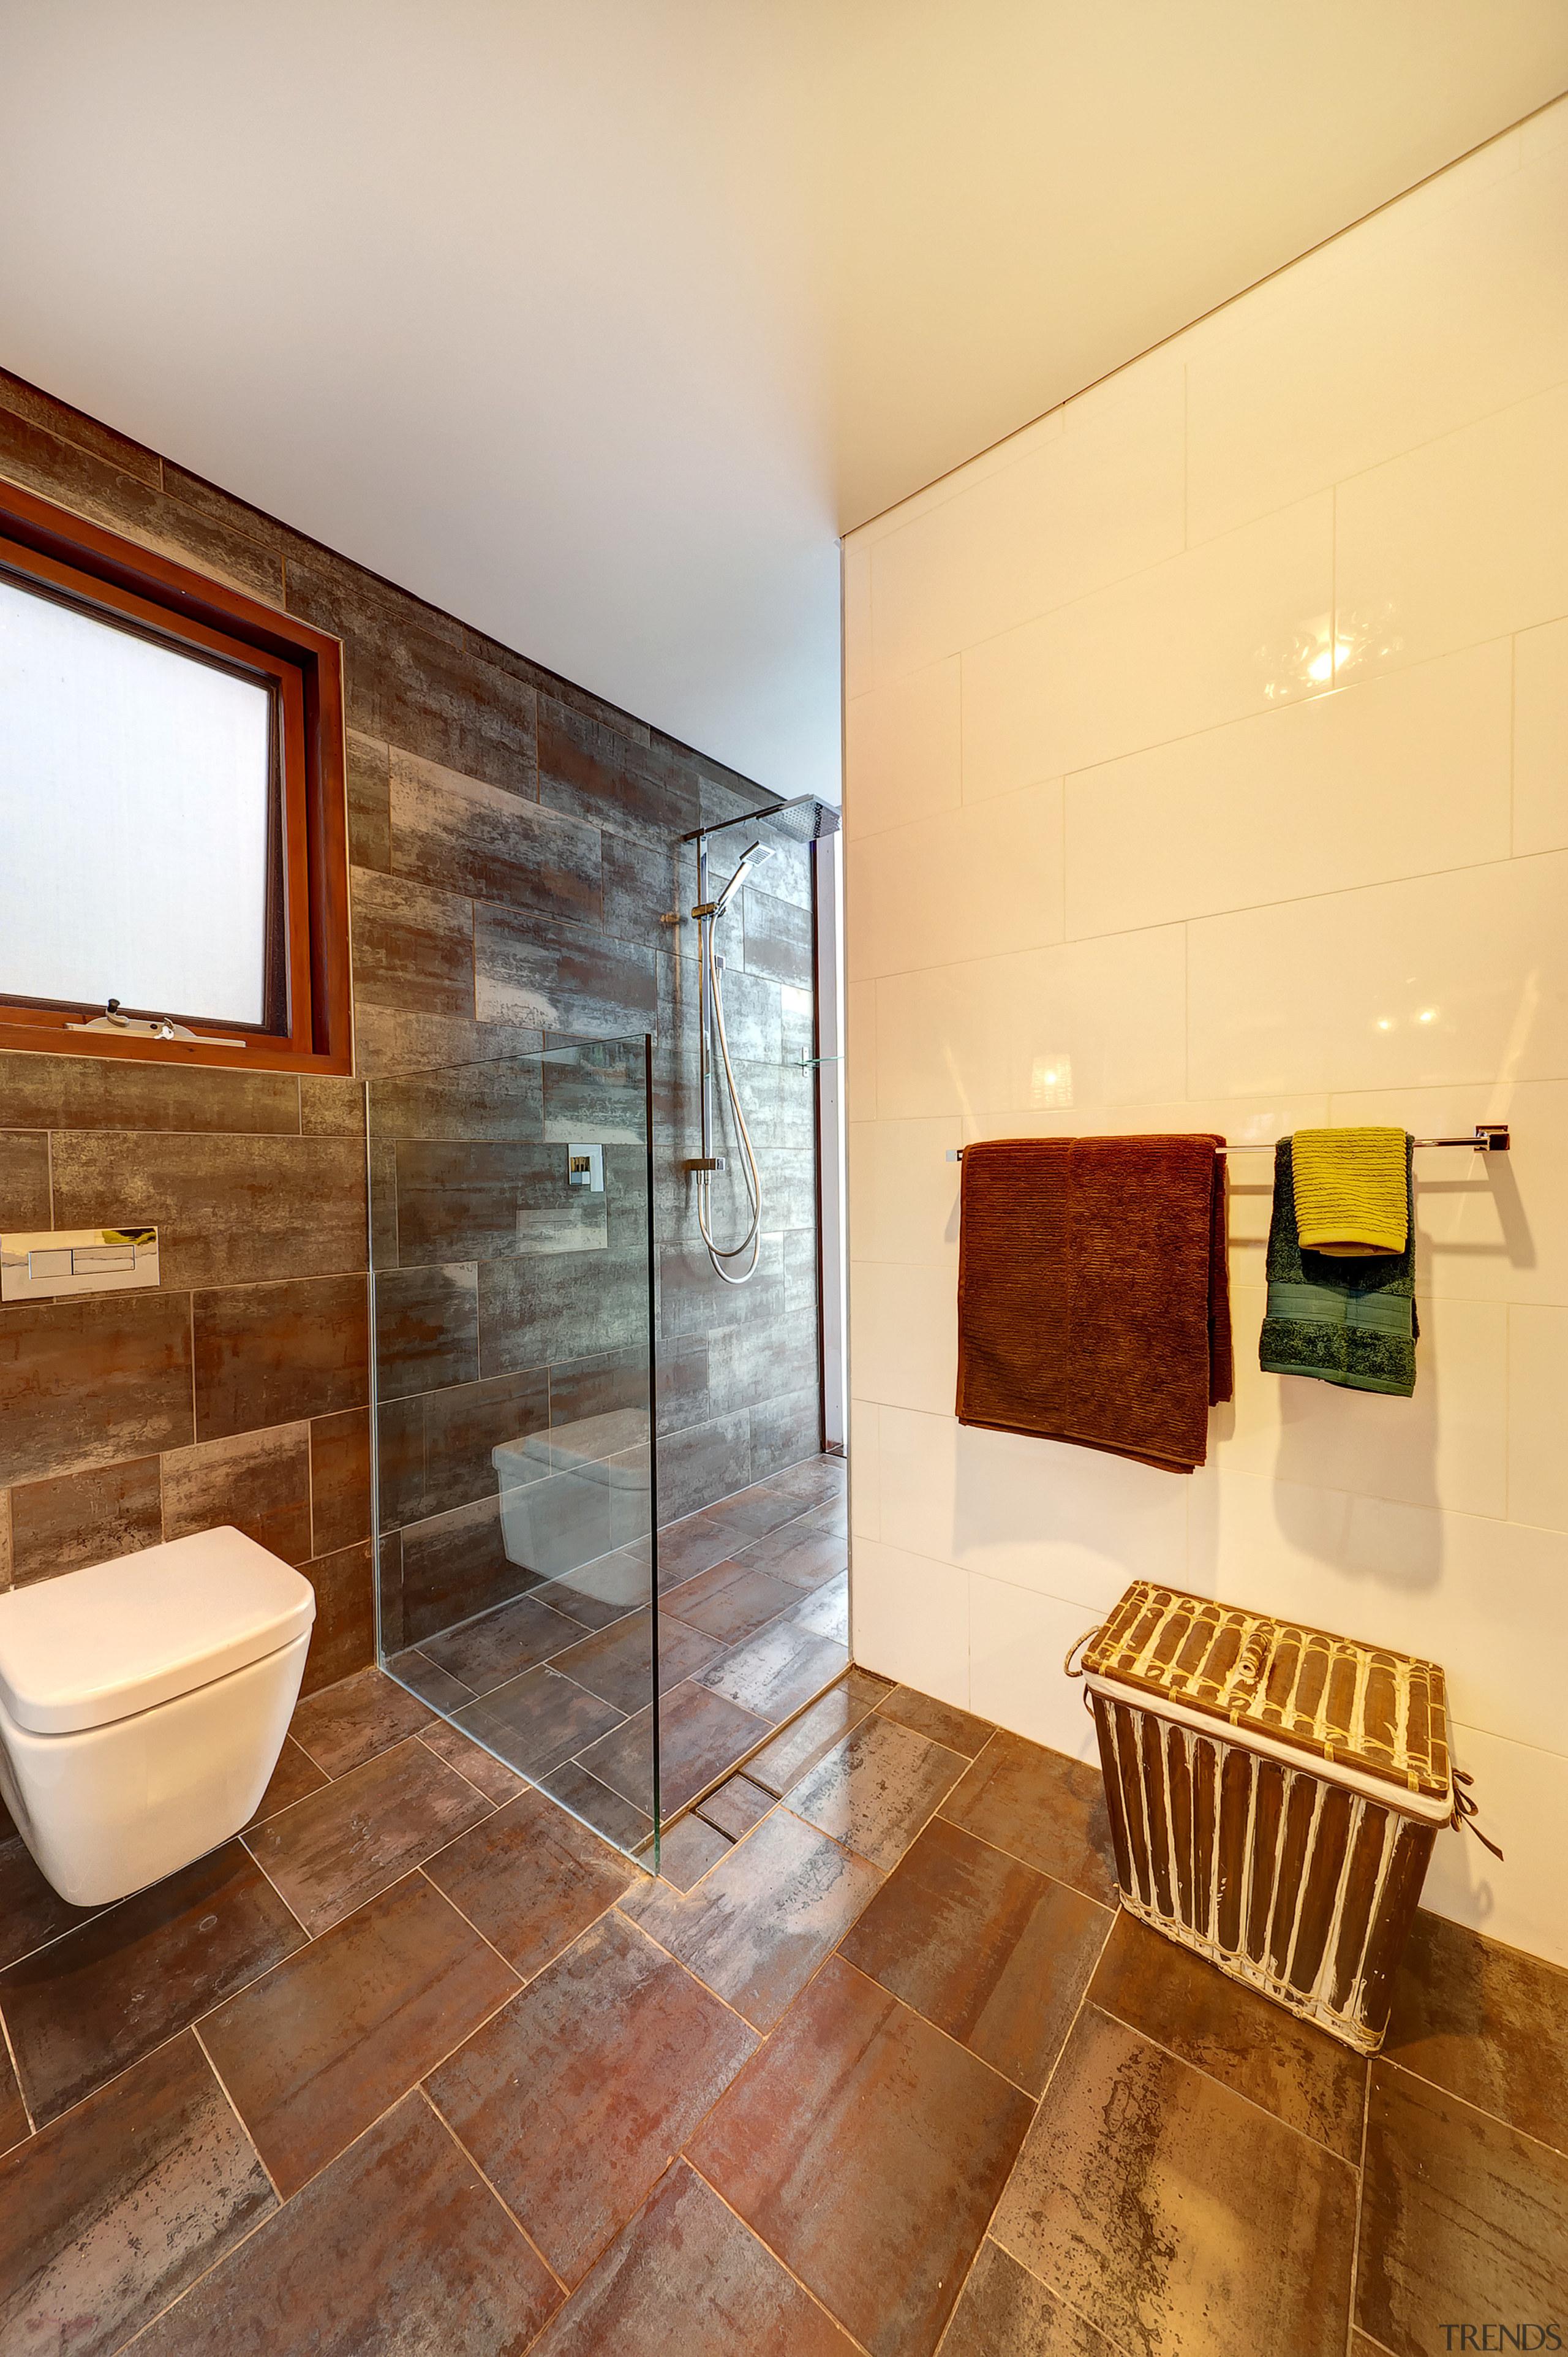 Tiles with a rusty metallic look line this architecture, bathroom, ceiling, estate, floor, flooring, home, house, interior design, real estate, room, tile, wood flooring, orange, brown